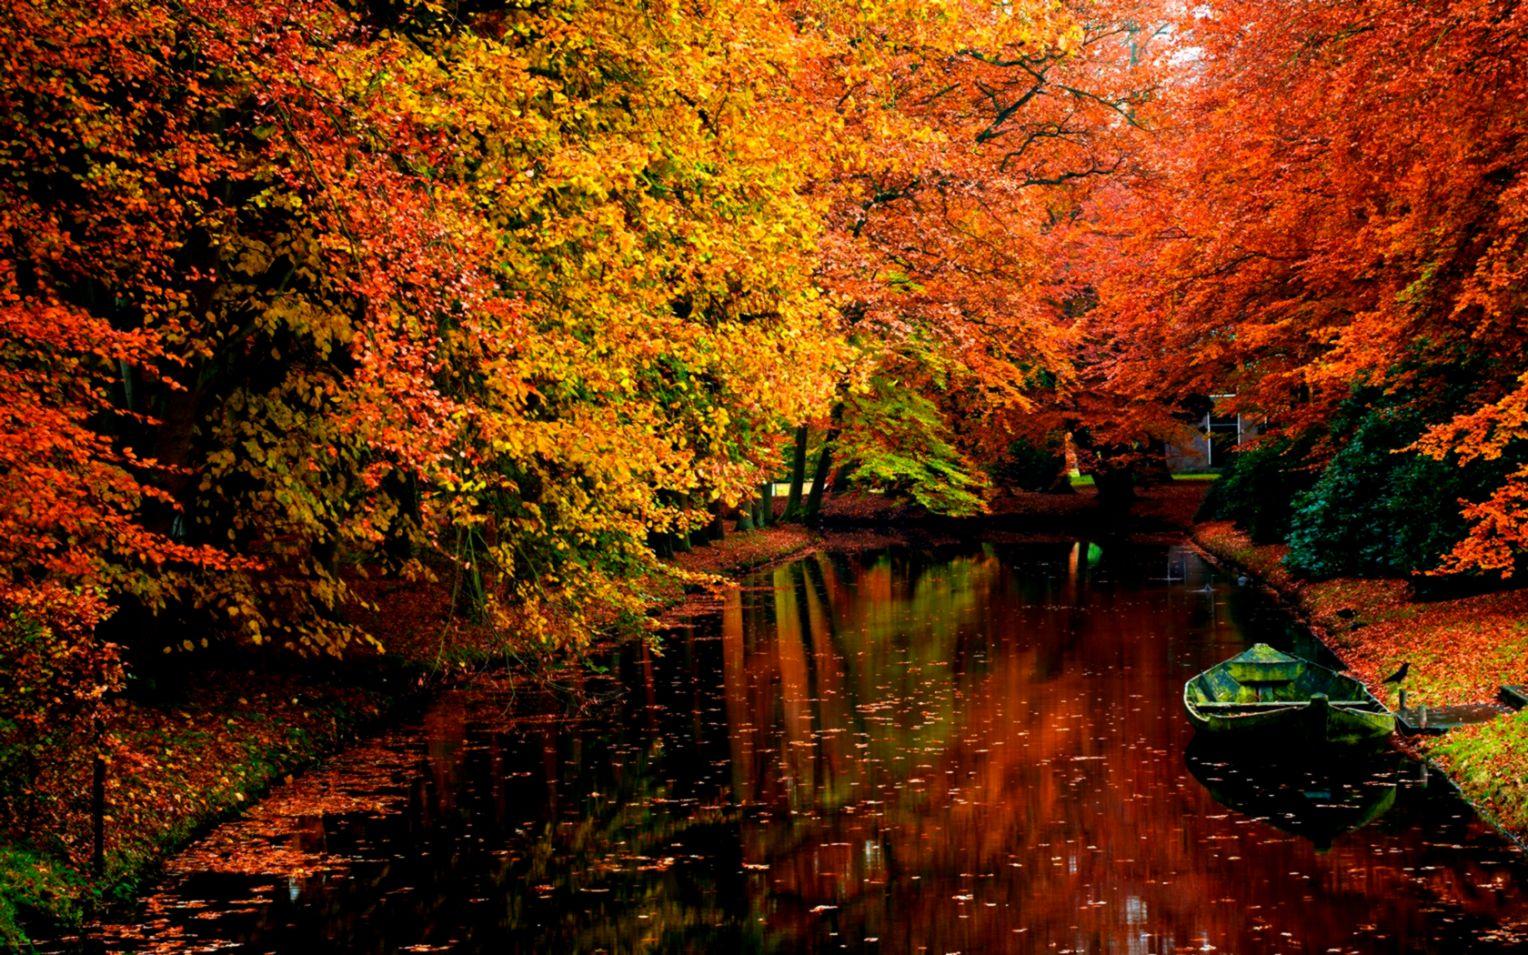 Autumn Wallpaper For Windows 7 Wallpapers Zones